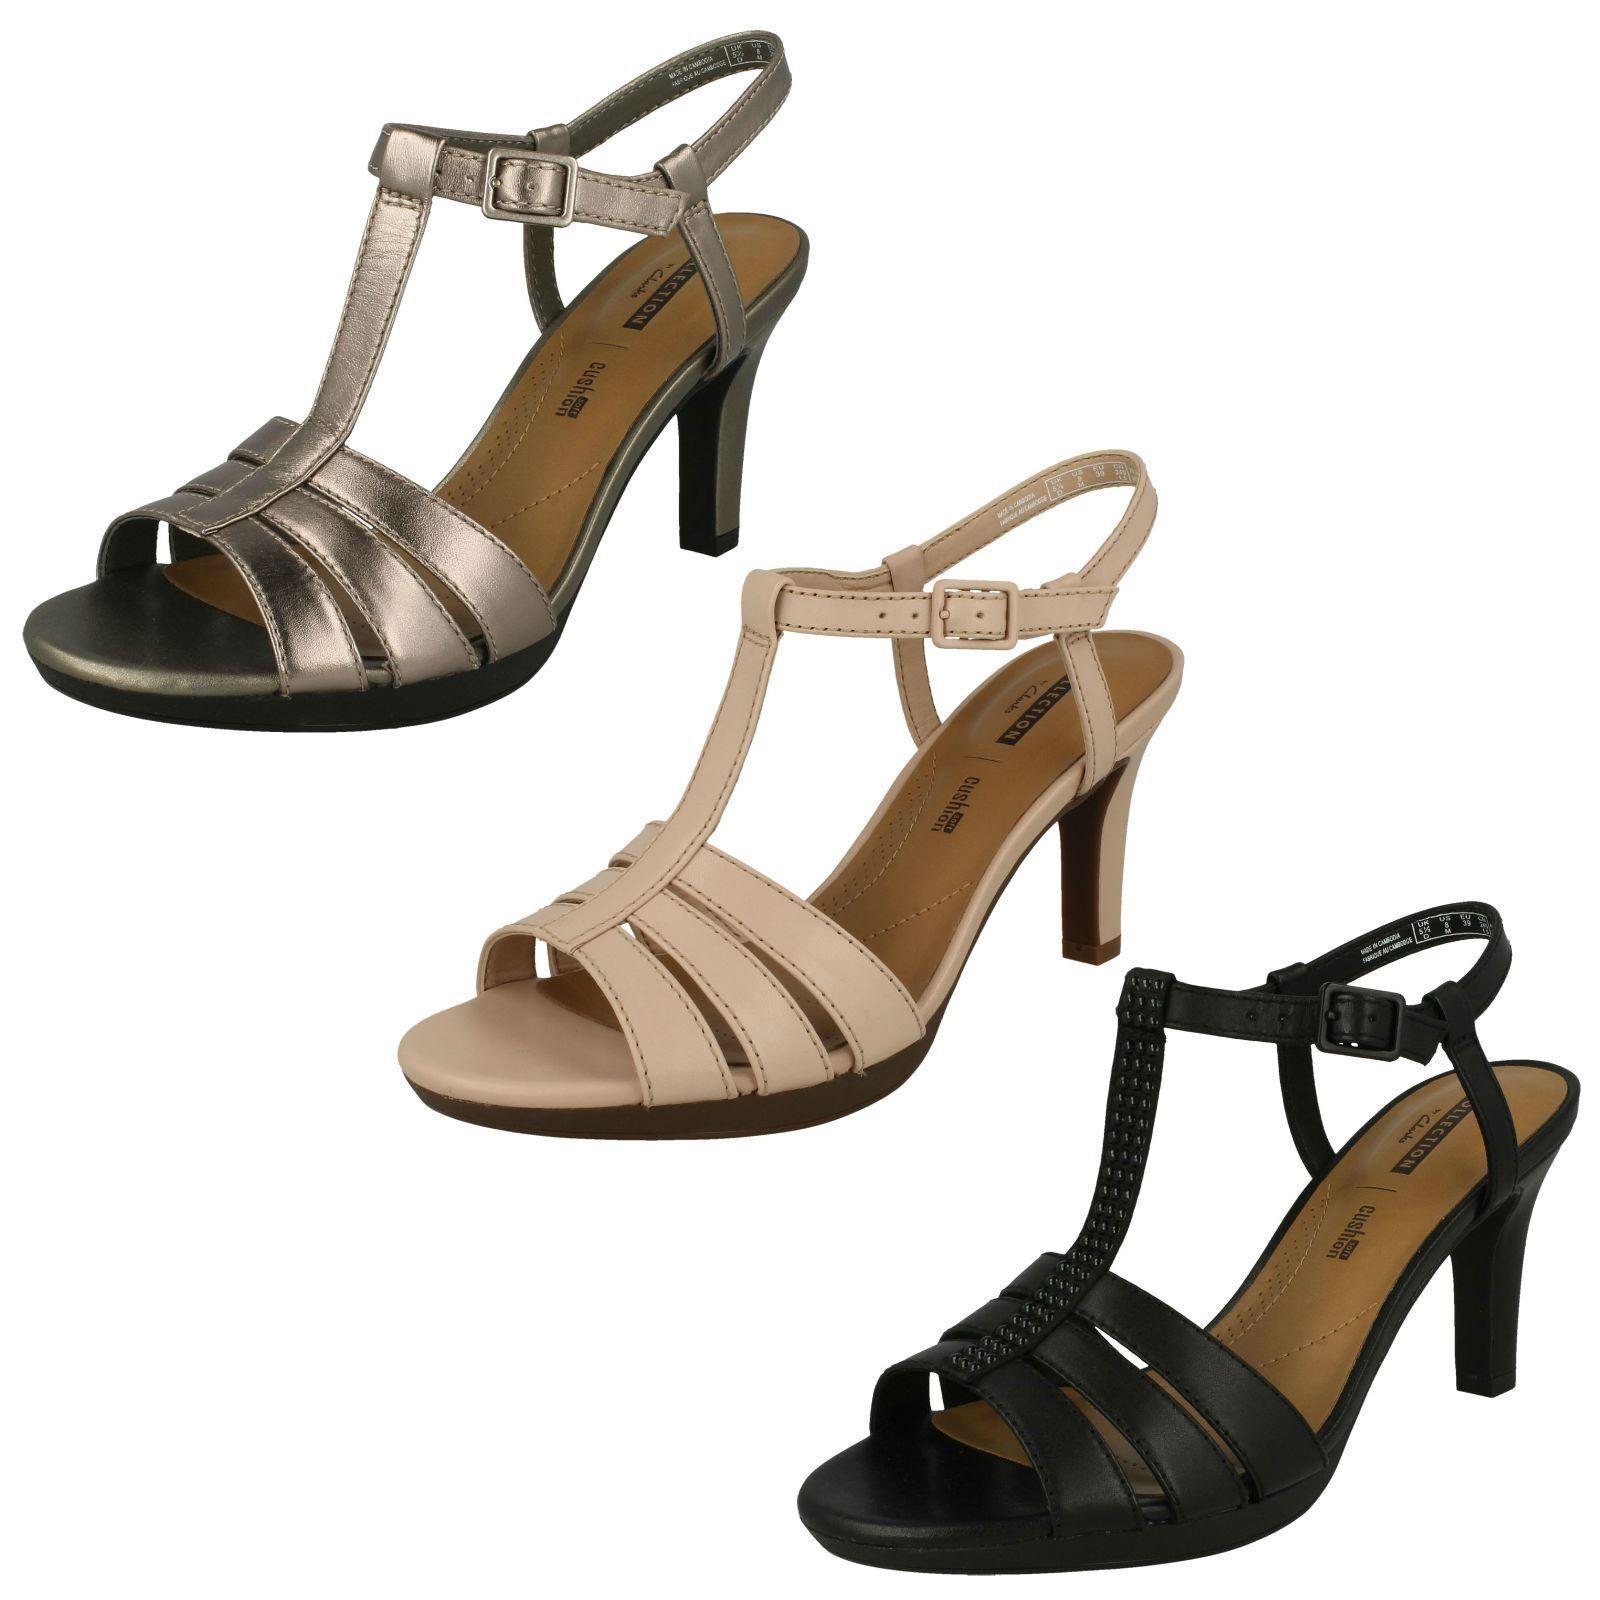 Ladies Clarks slingback sandals 'Adriel Tevis'